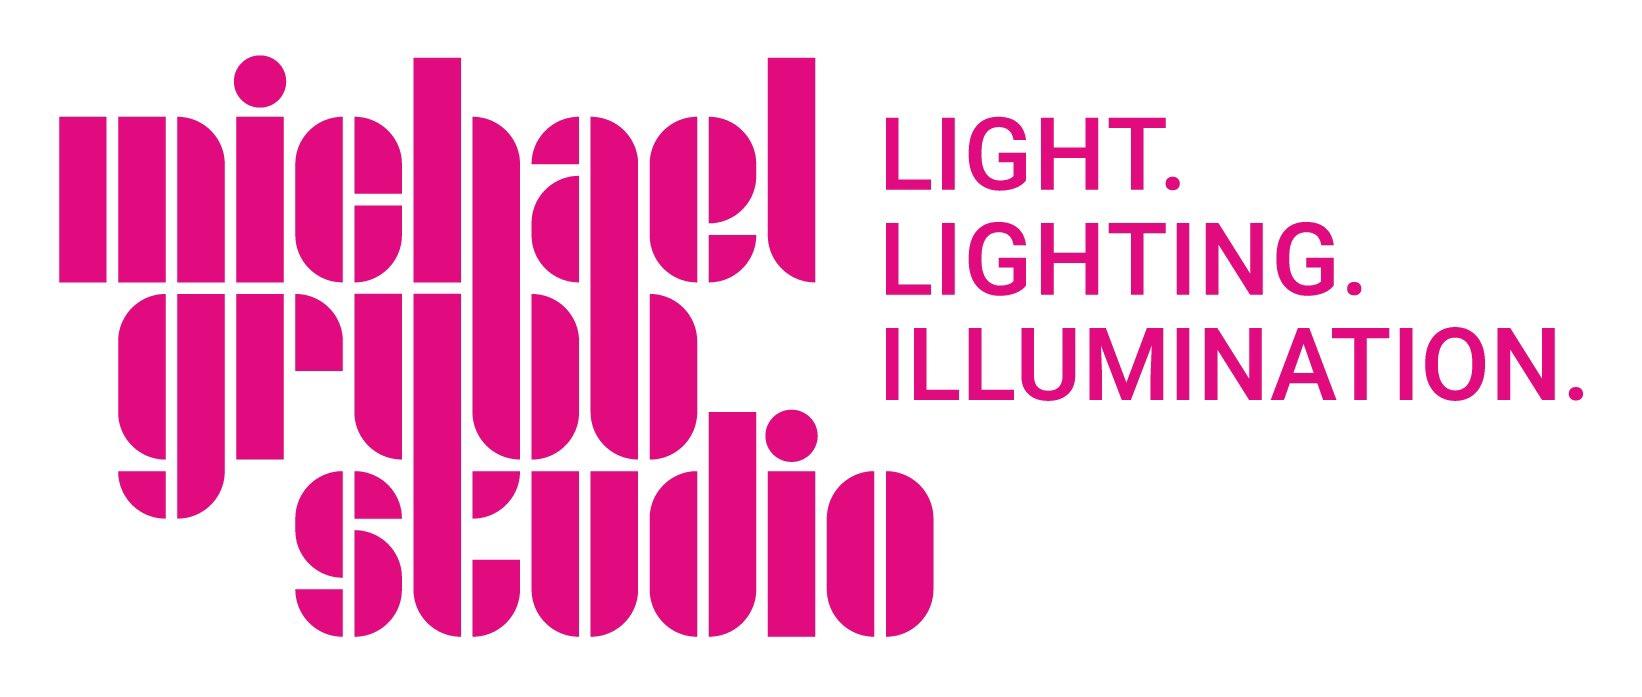 "Michael Grubb Studio on Twitter: ""Our new logo and strapline. Graphic  design by @saul_studio #brand #logo #lighting… """